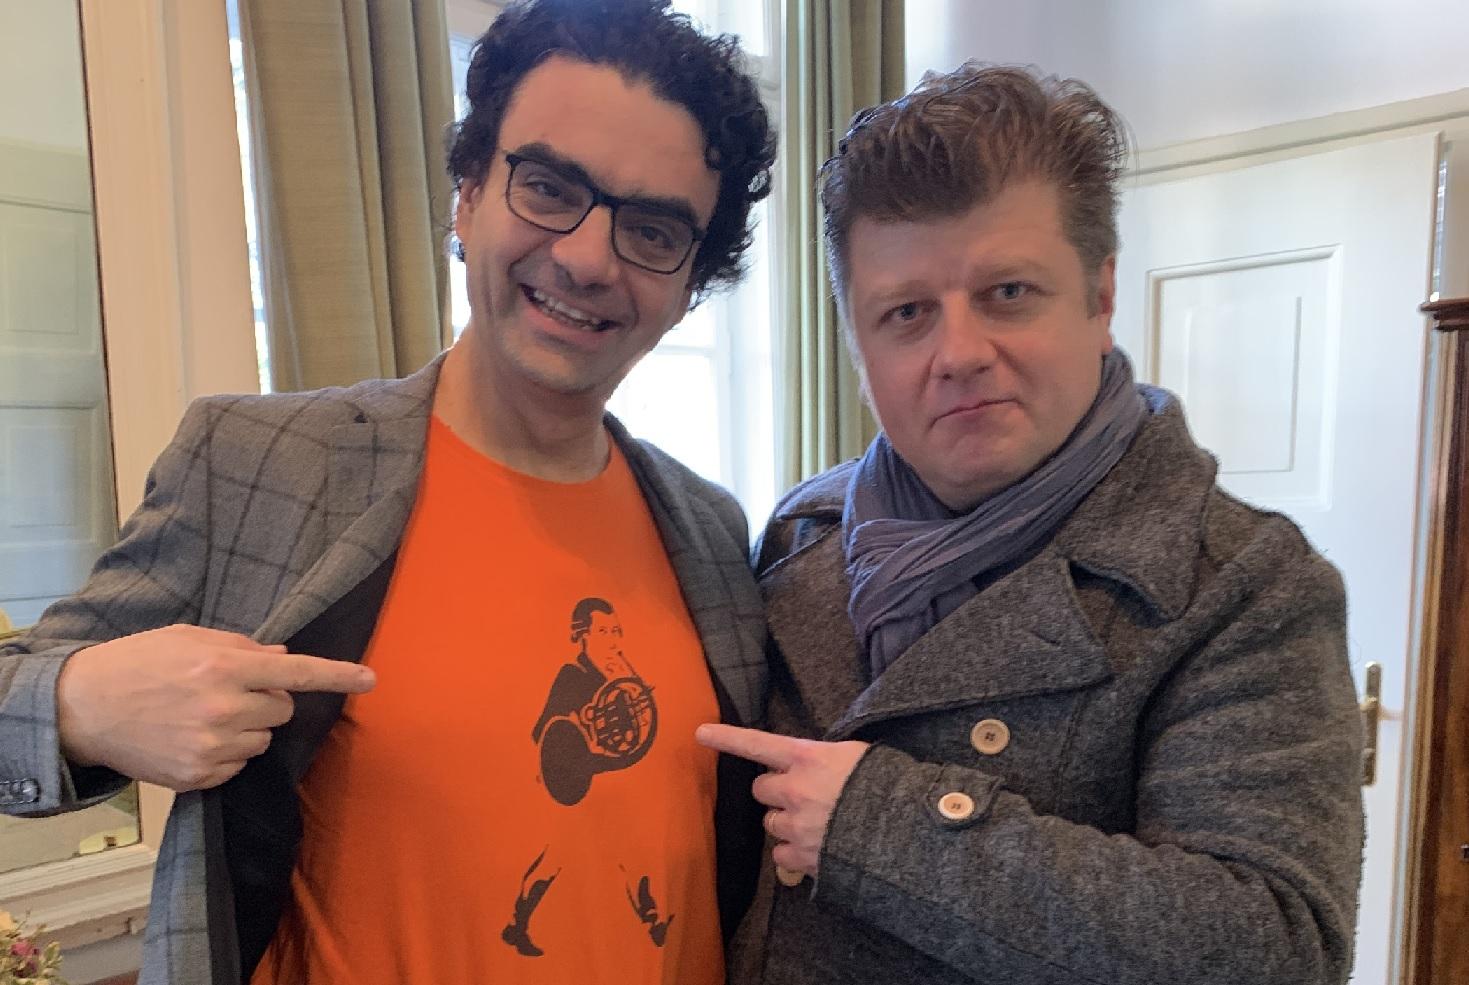 Hornista a dirigent Radek Baborák debutoval s Vídeňskými filharmoniky a oslnil jako sólista festivalu Mozartwoche v Salzburku